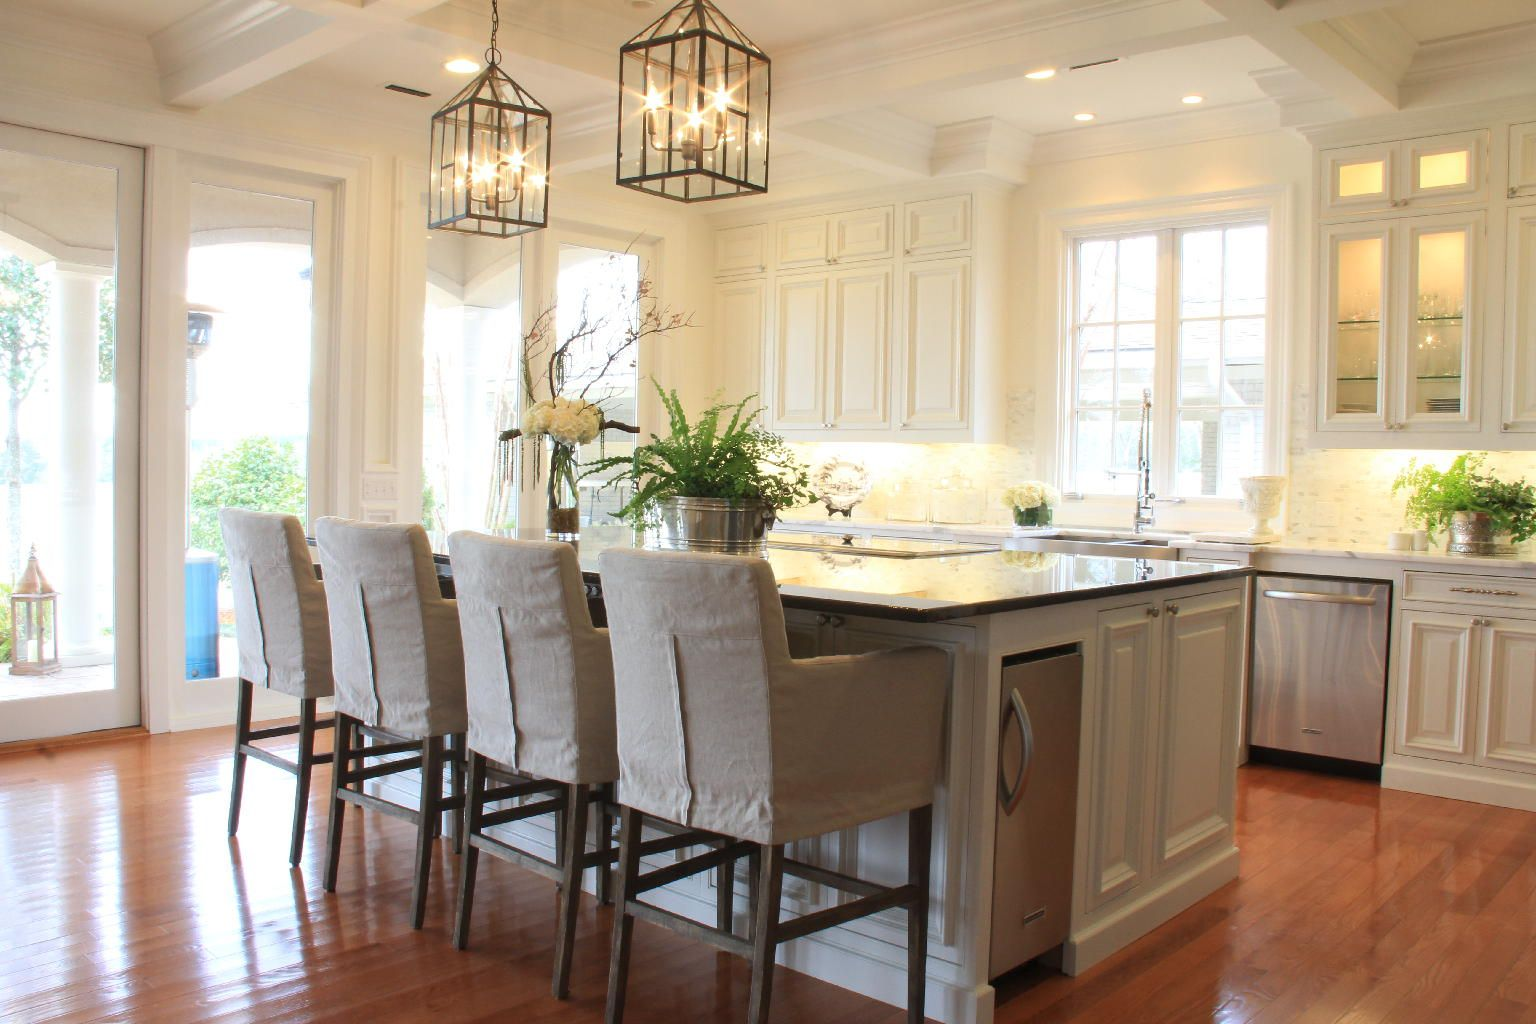 Slip covered, linen bar stools | Interiors: Kitchen | Pinterest ...